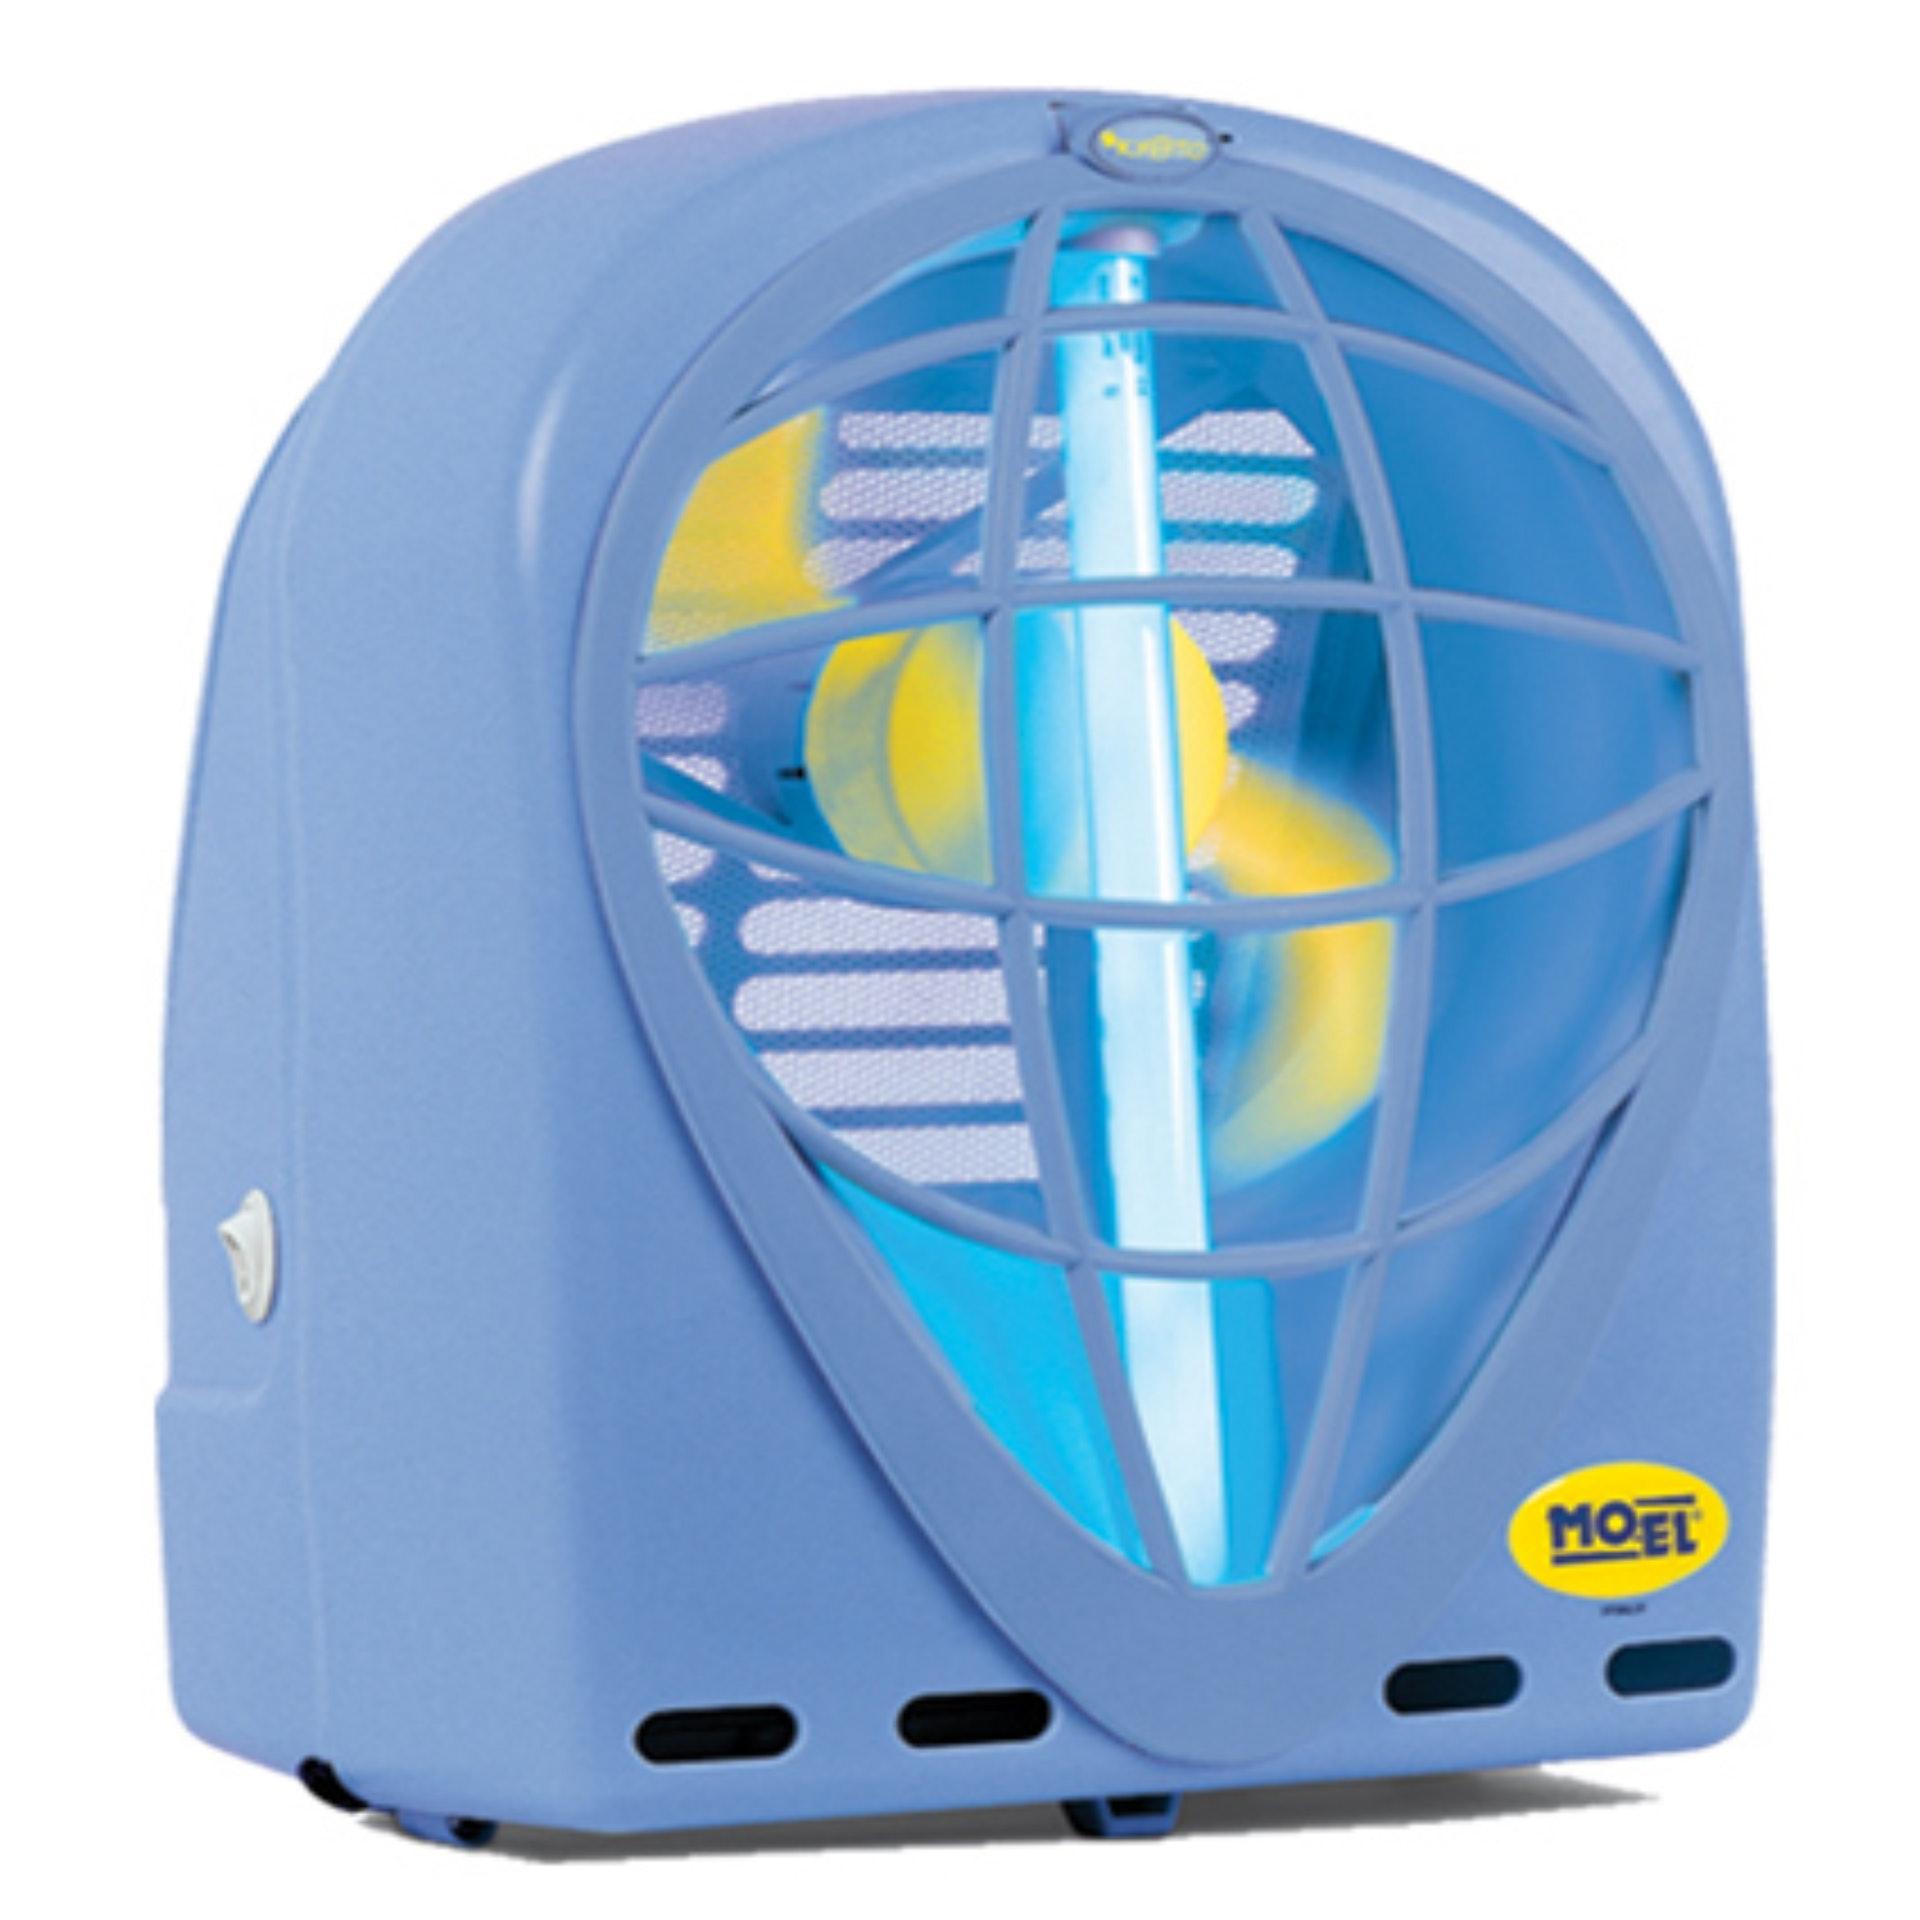 Turbo Italy|<專利吸入式捕蚊系統(風乾型式殺滅蚊蟲)> 優惠價$448(81折-原價$548)。